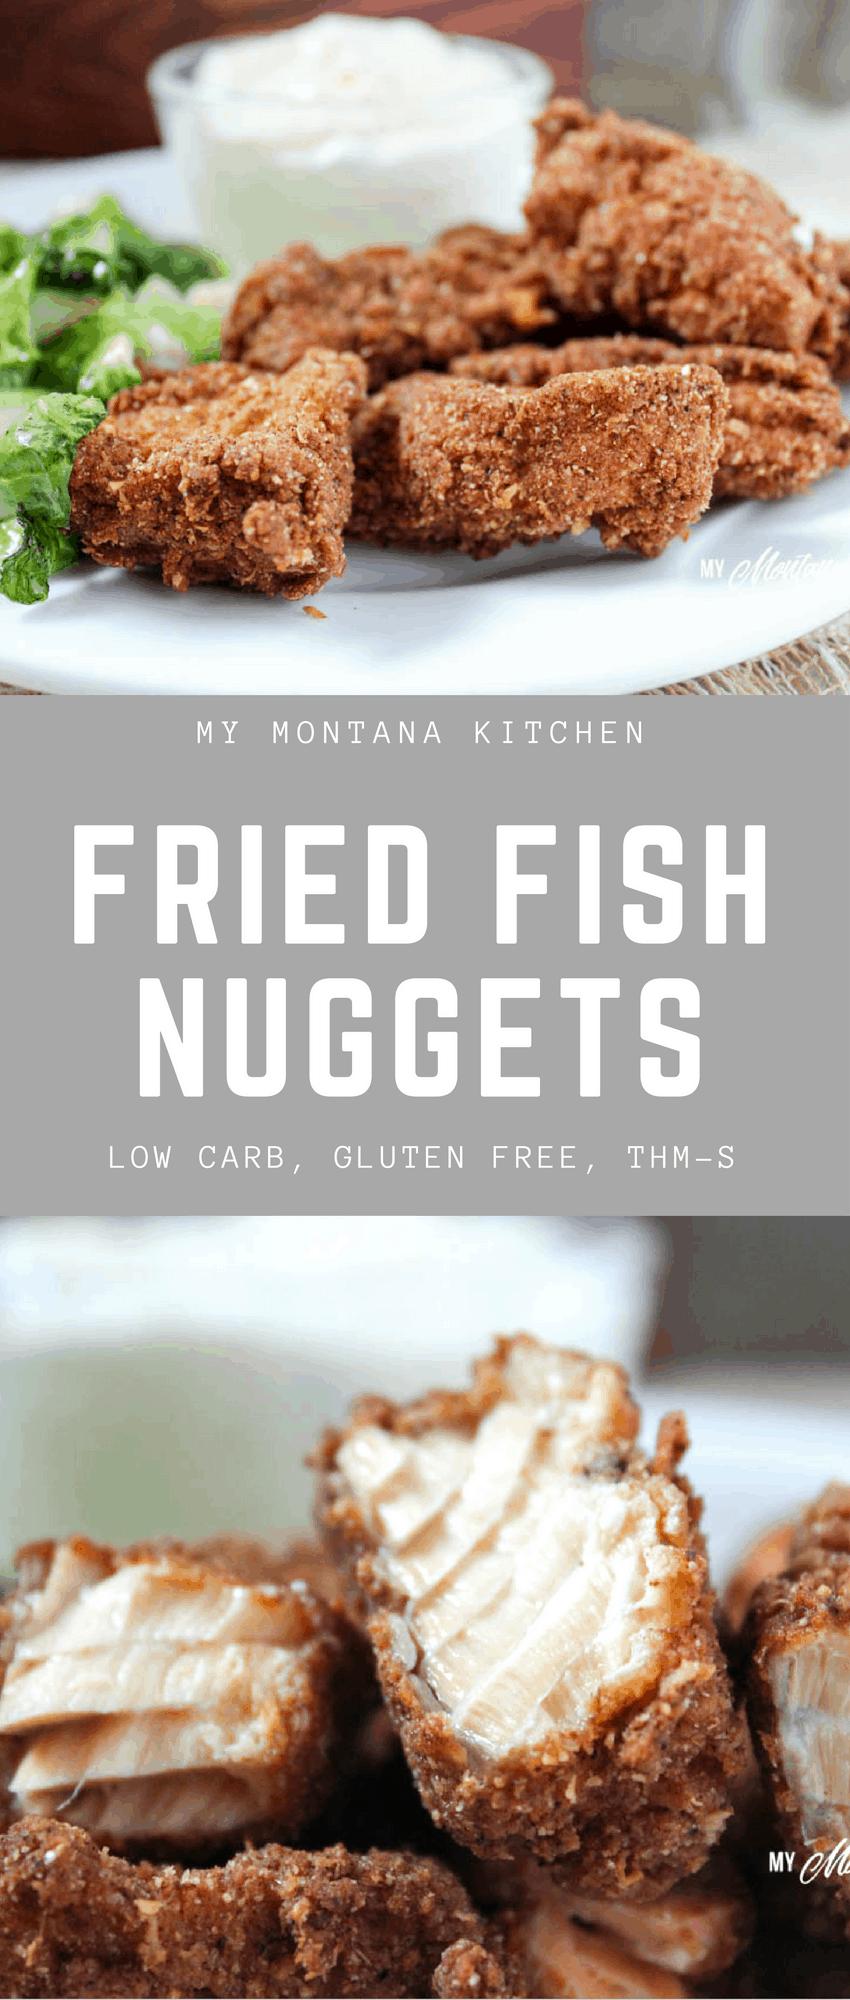 Low Carb Fried Fish Nuggets (Gluten Free, THM-S) #trimhealthymama #thm #friedfish #lowcarb #glutenfree #fishnuggets